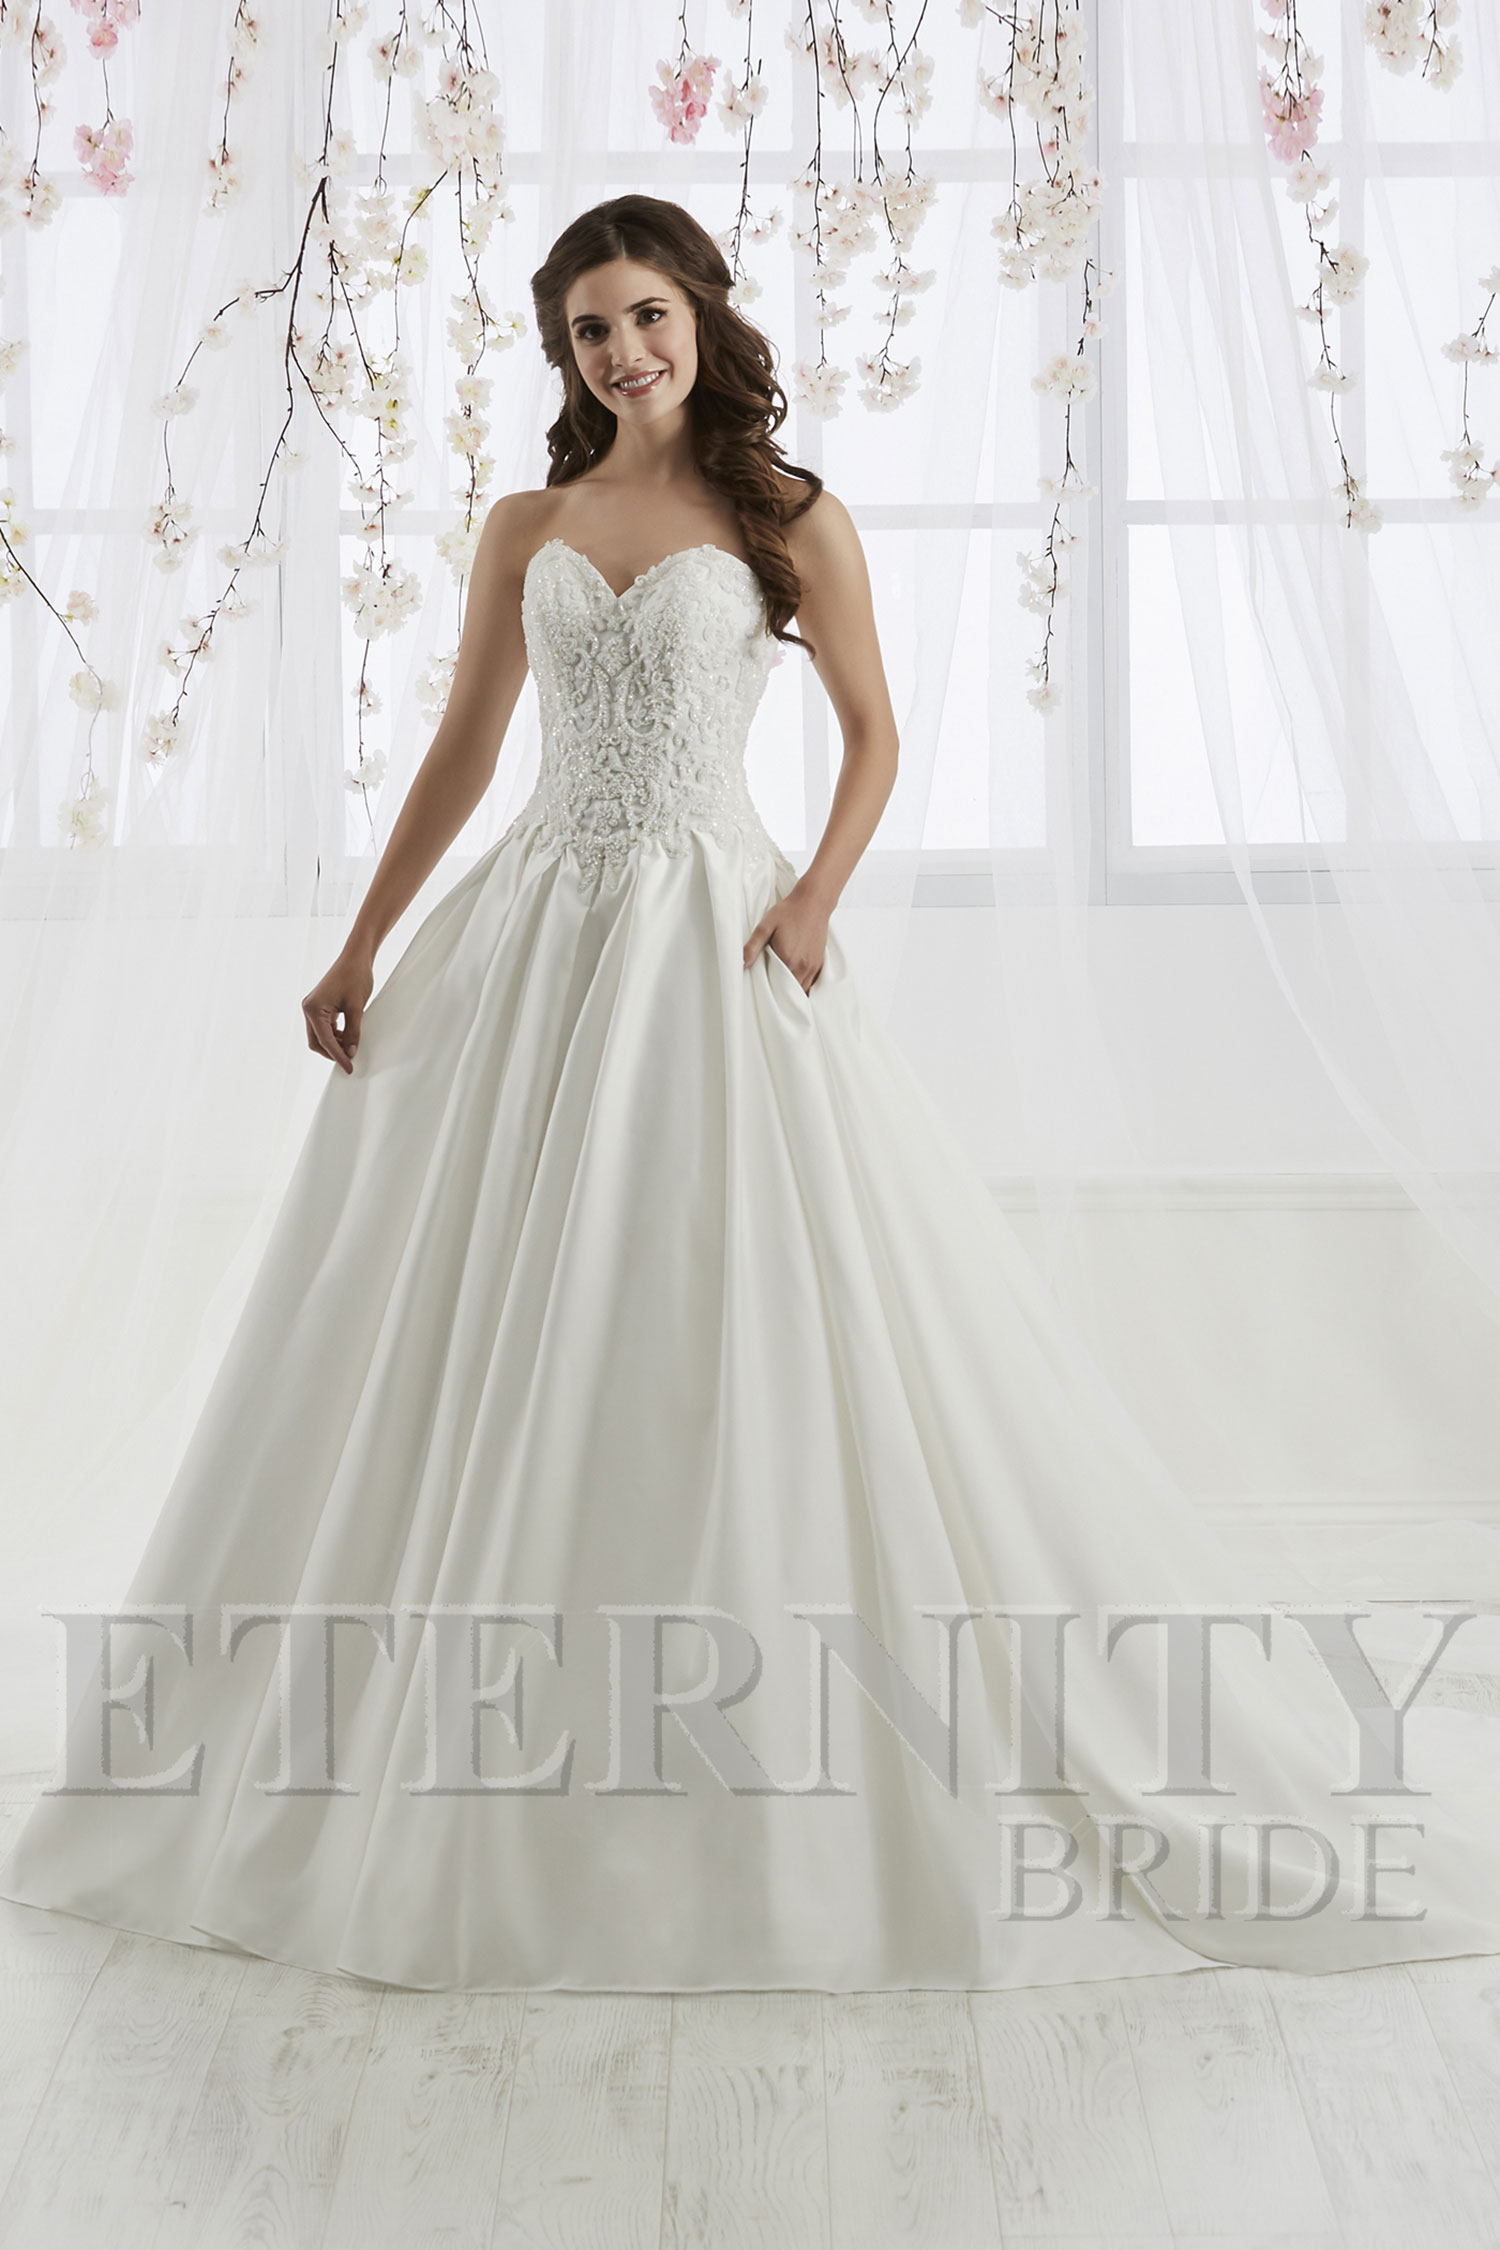 Eternity Bride D5618